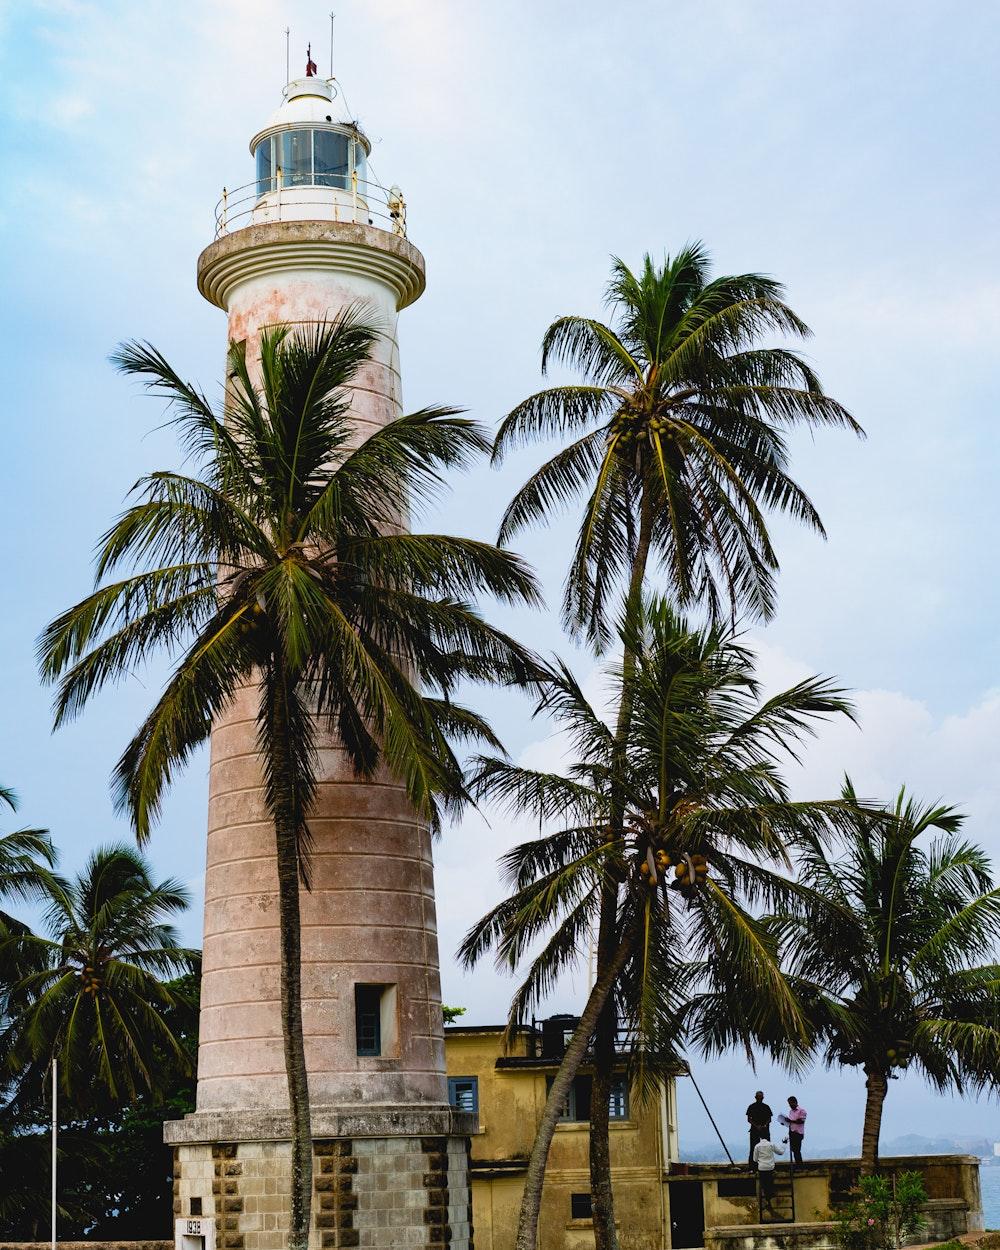 The Galle Lighthouse in Sri Lanka